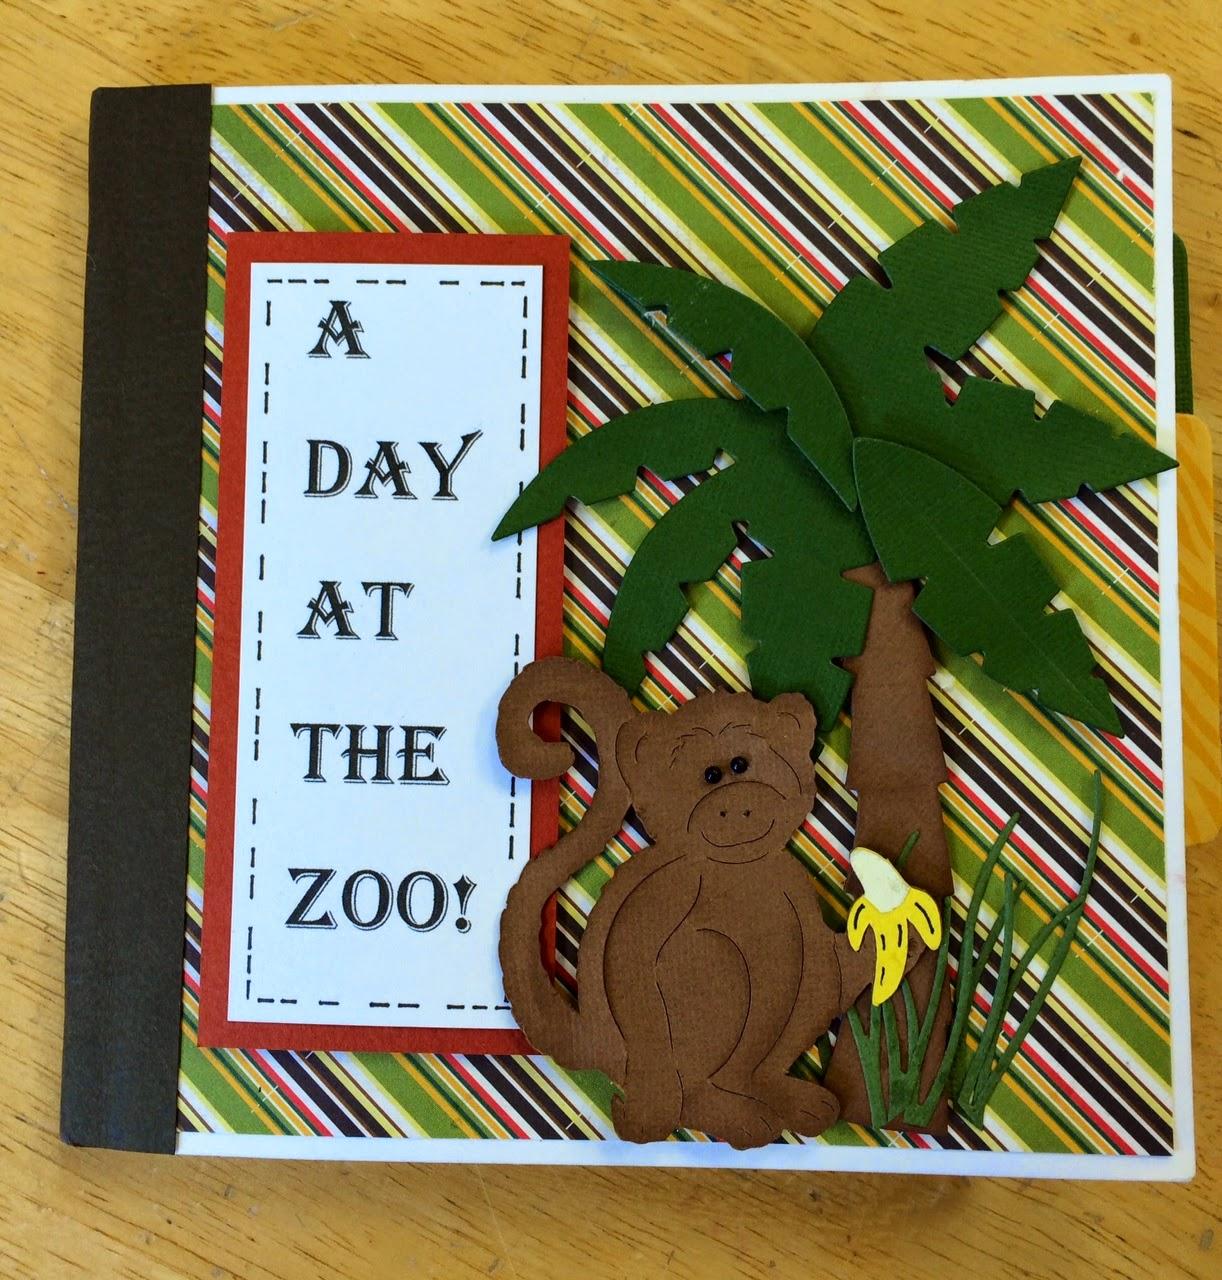 723 debis zoo envelope mini album perfect class for the kids